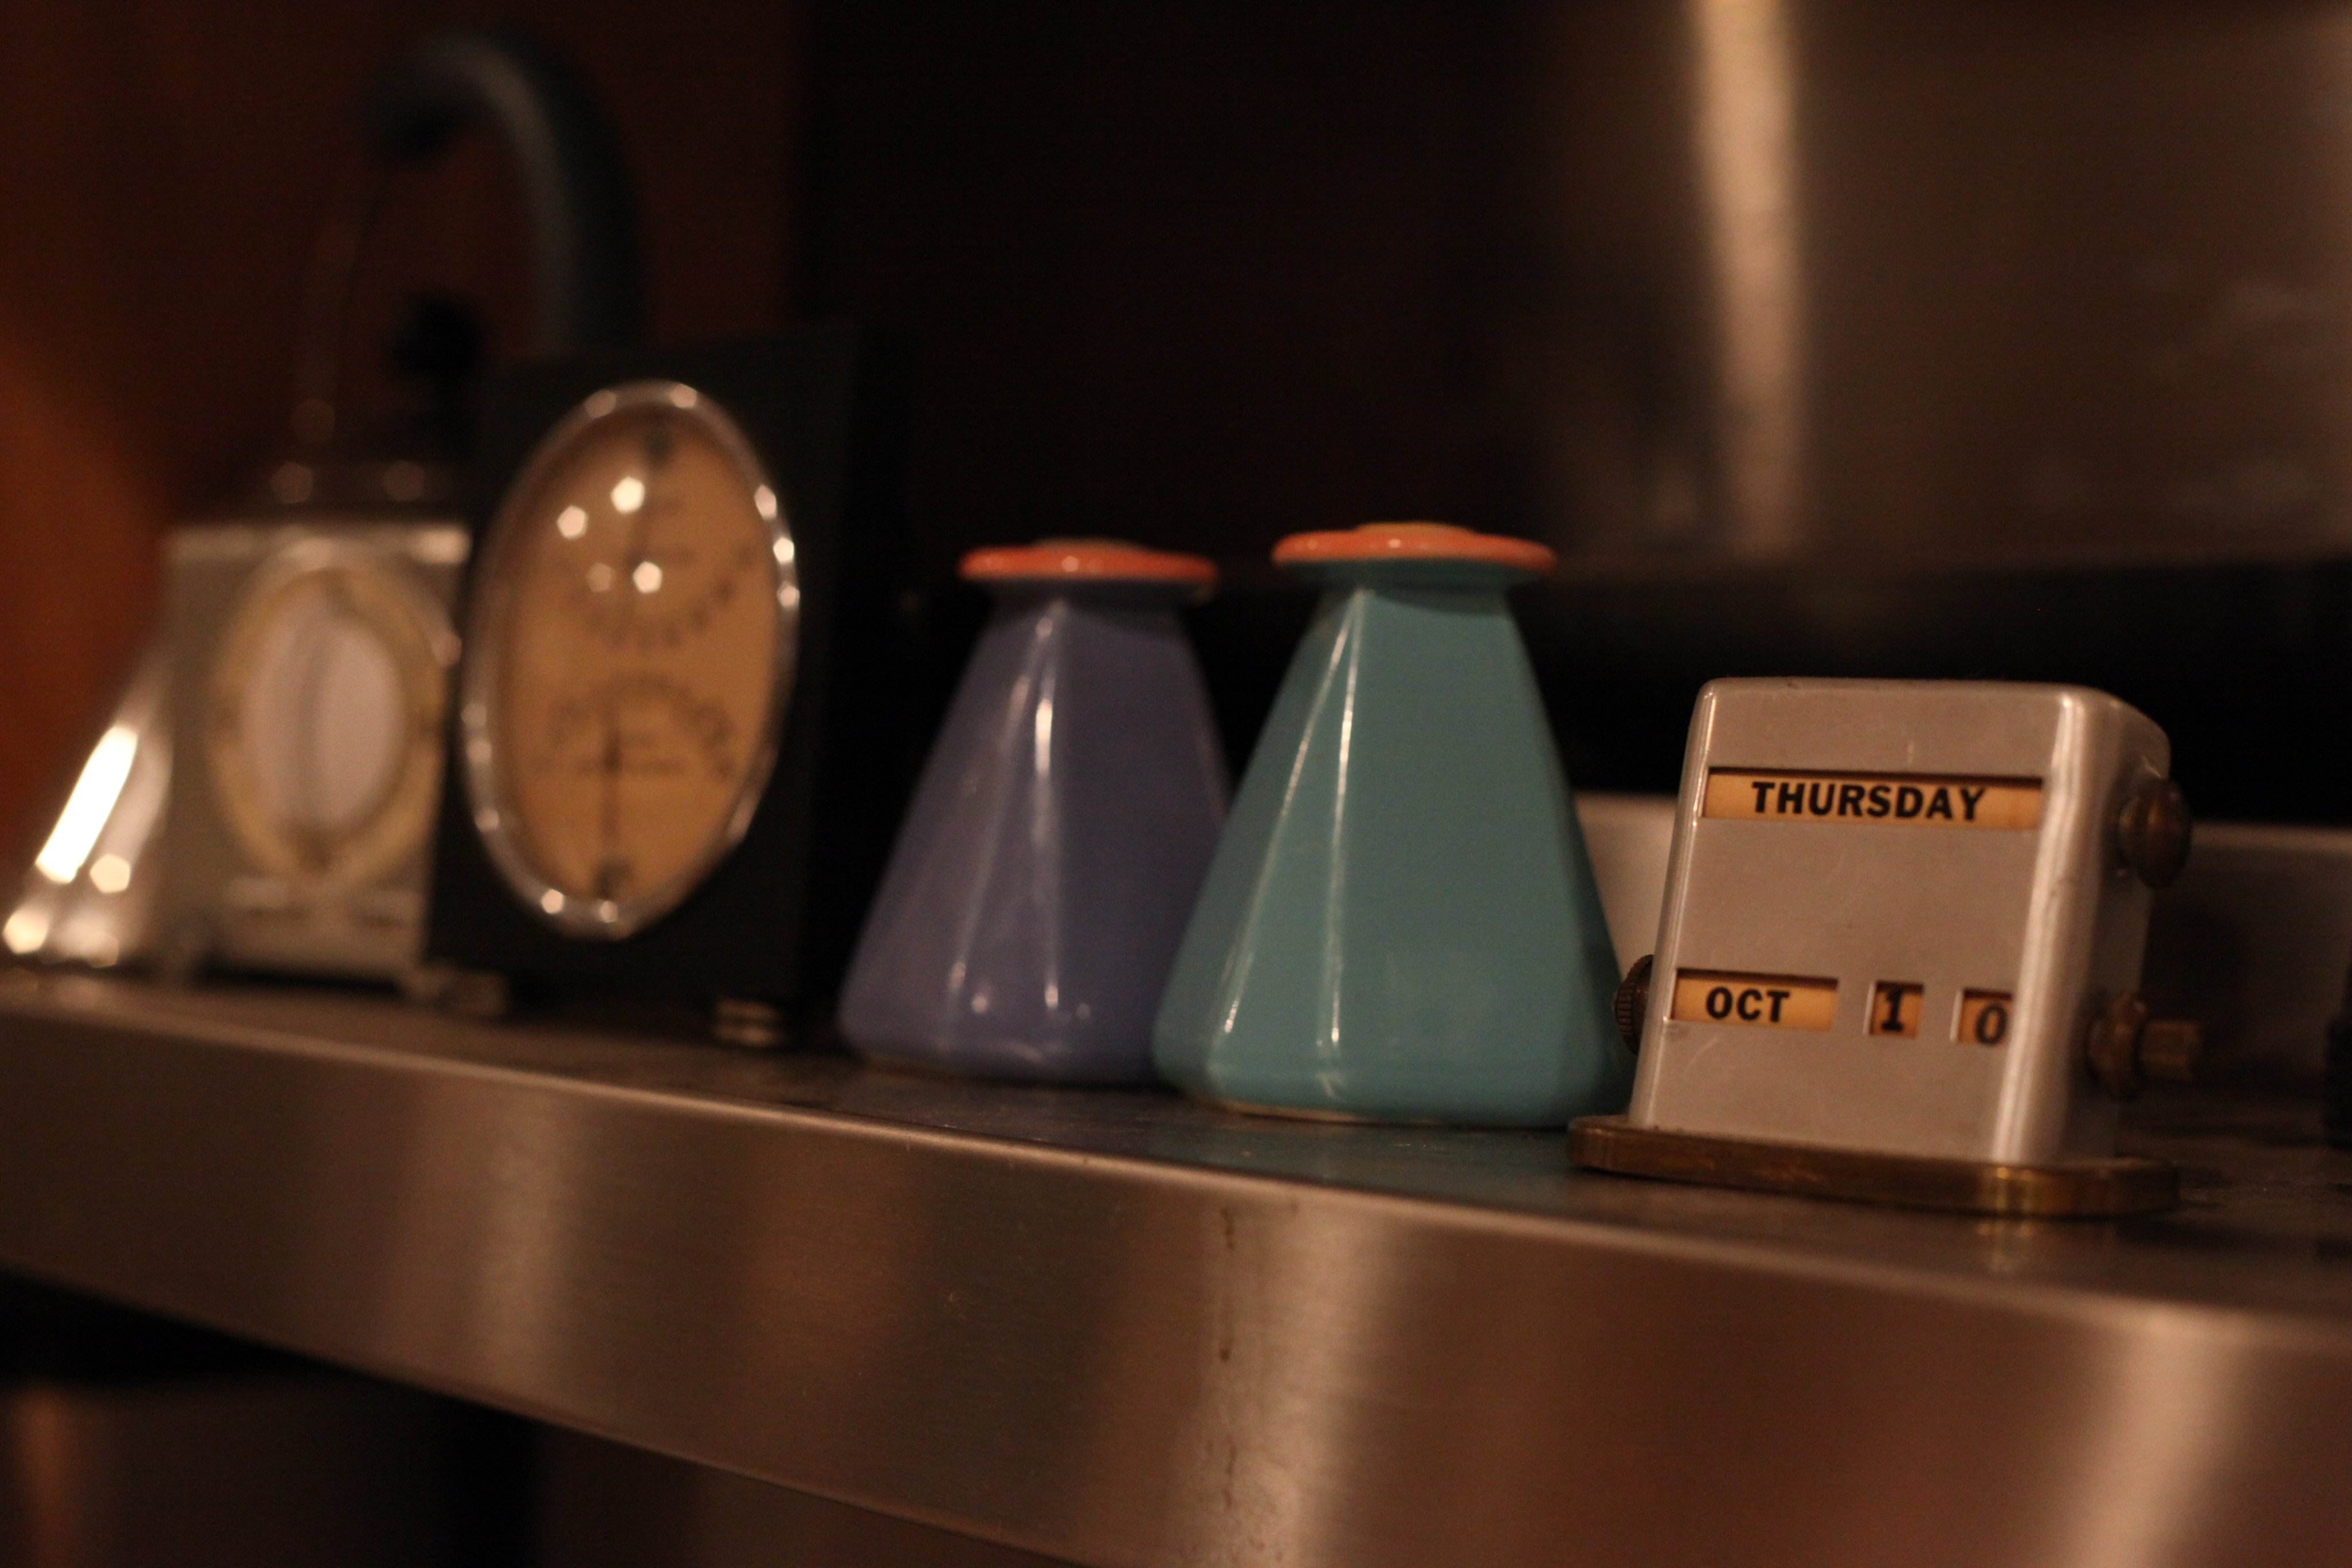 shelf on the stove